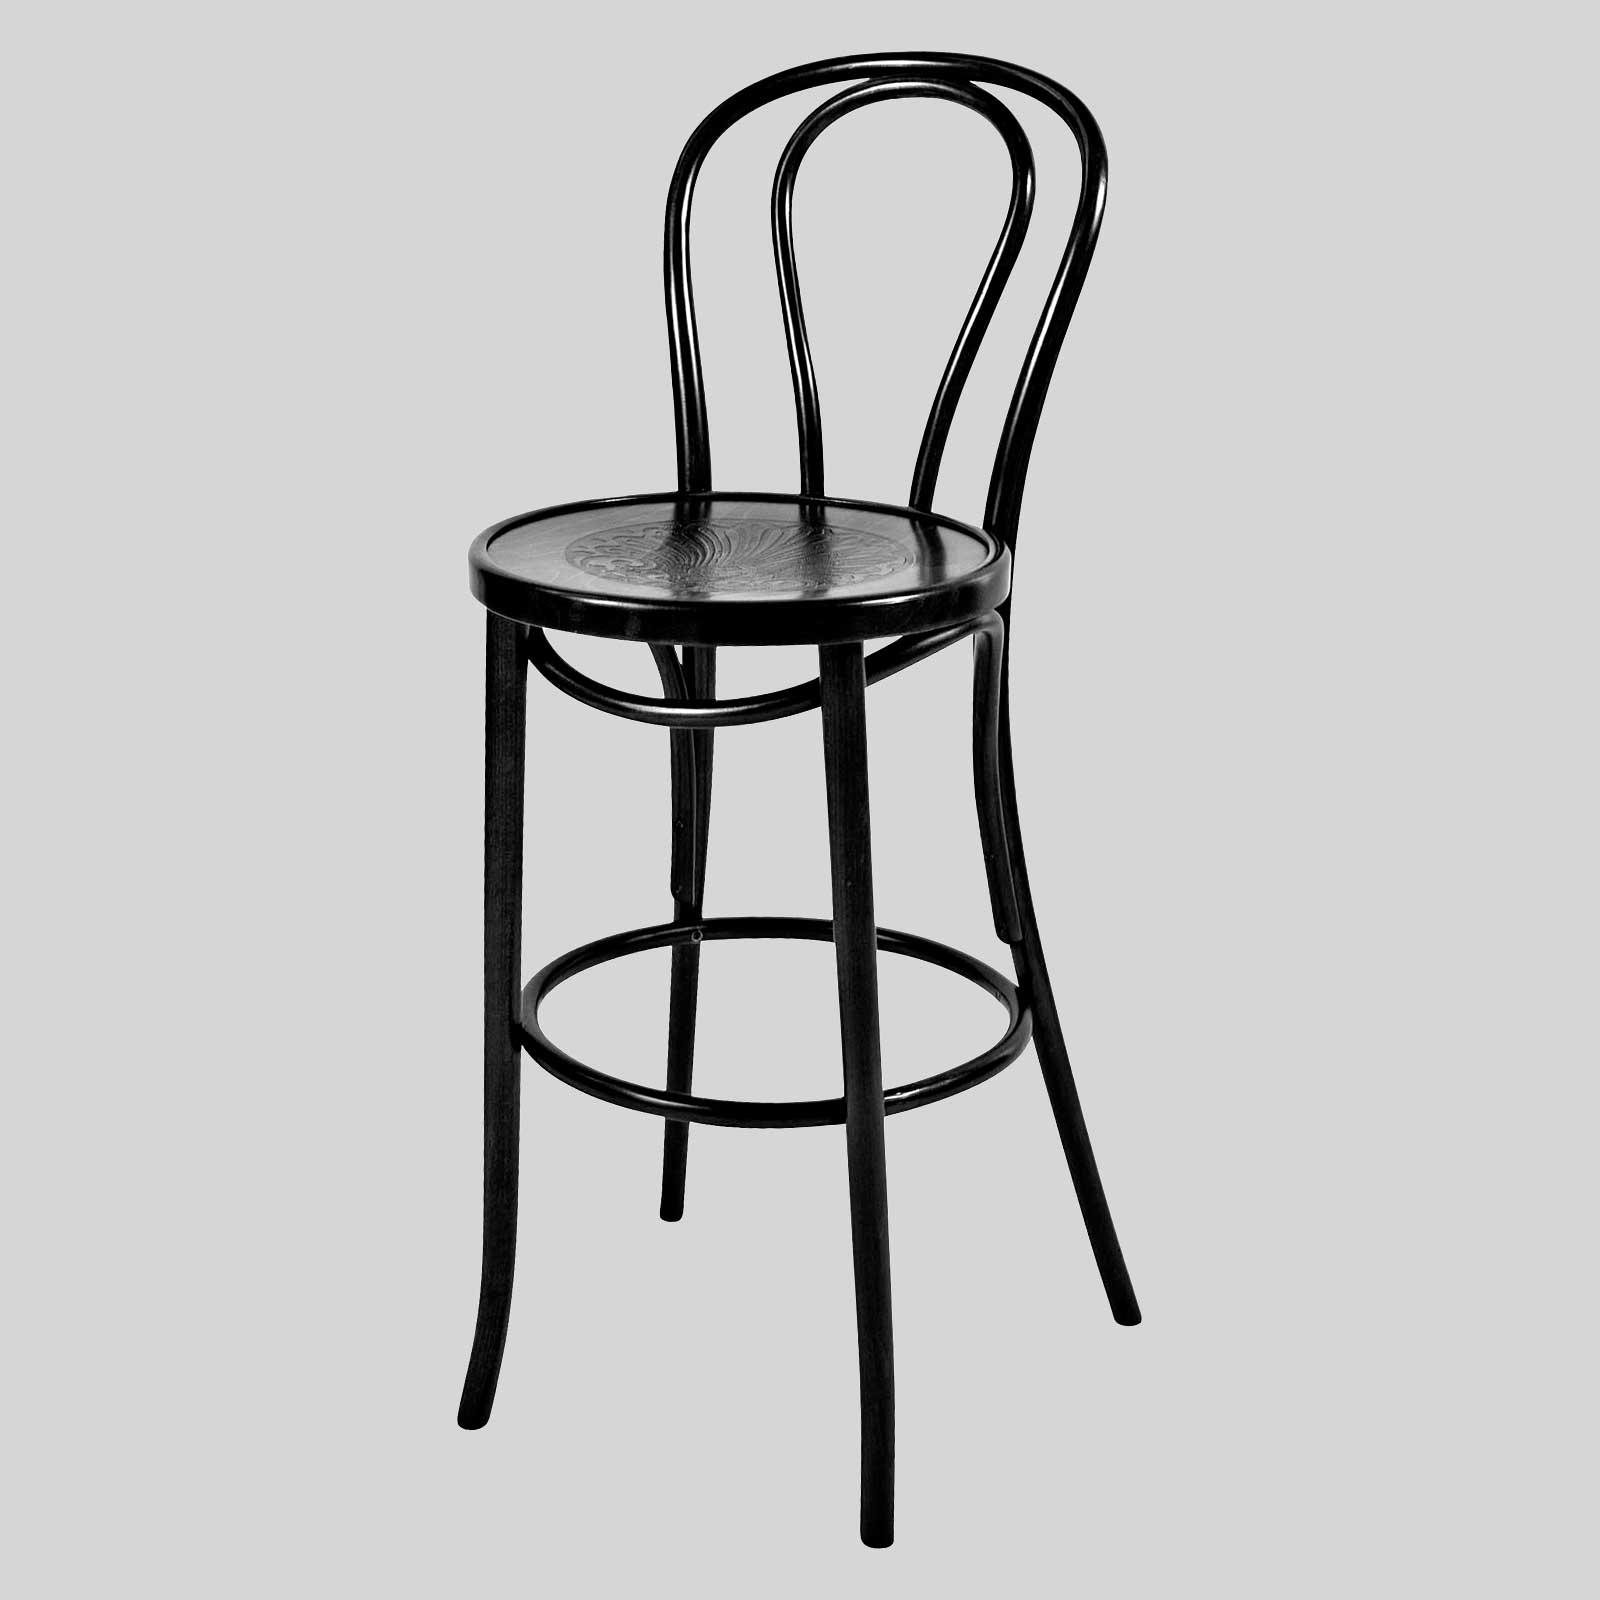 Sensational Bentwood Barstools Classique Concept Collections Dailytribune Chair Design For Home Dailytribuneorg